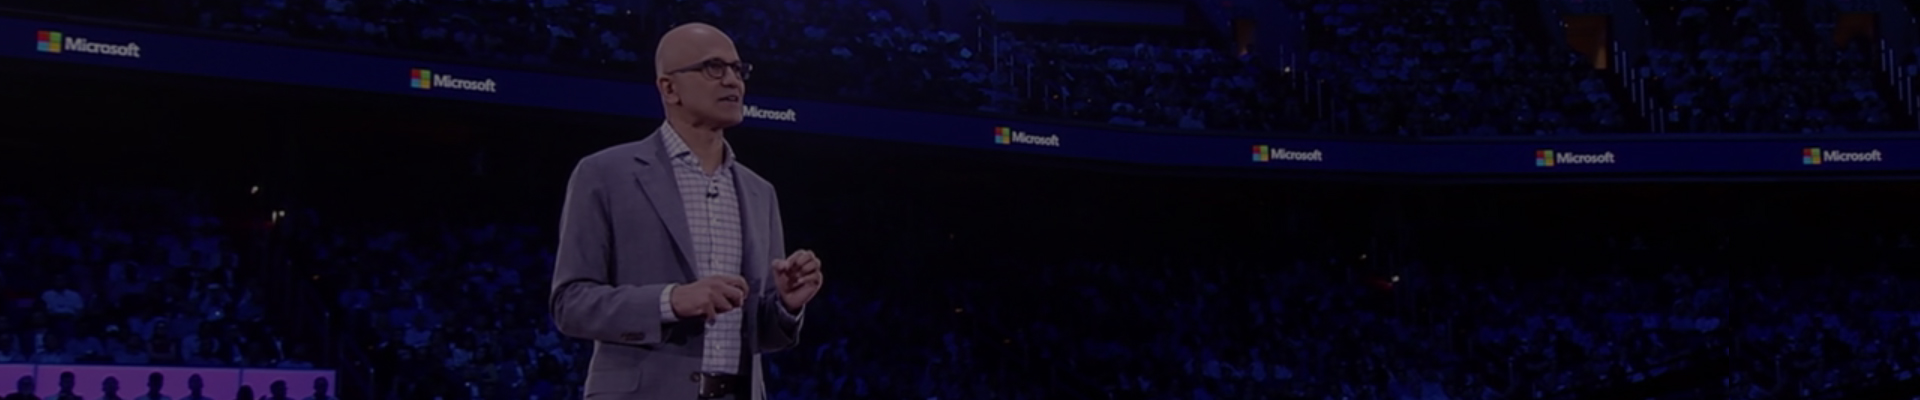 Watch Satya announce Microsoft 365